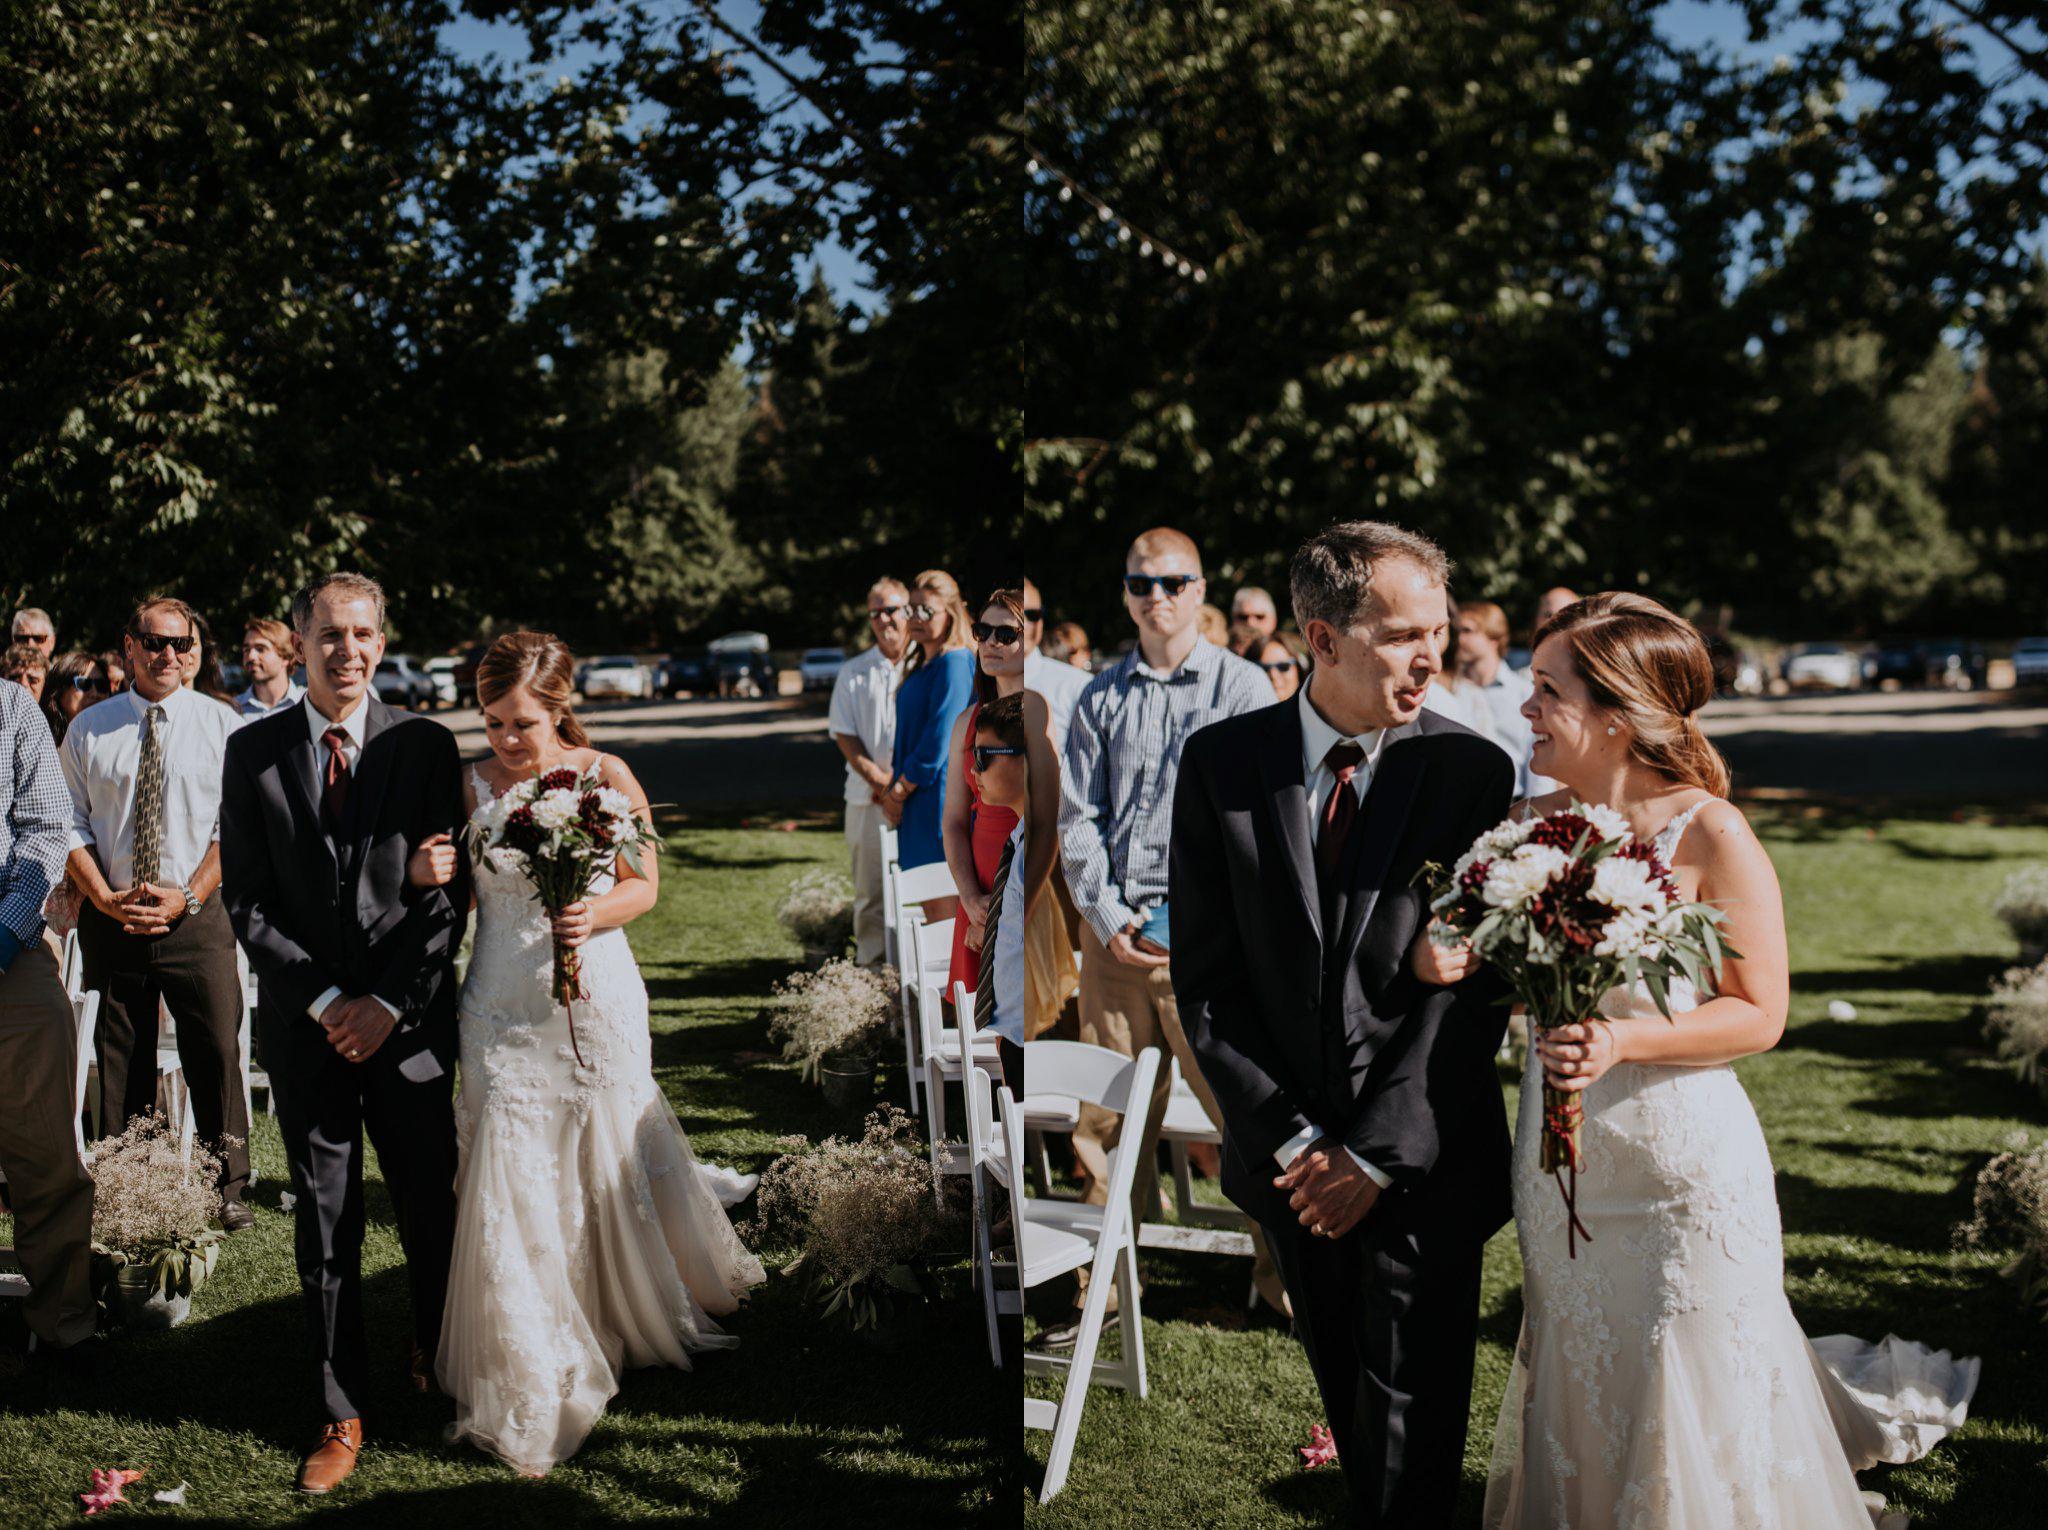 kristen-and-cody-the-kelley-farm-wedding-seattle-photographer-caitlyn-nikula-58.jpg